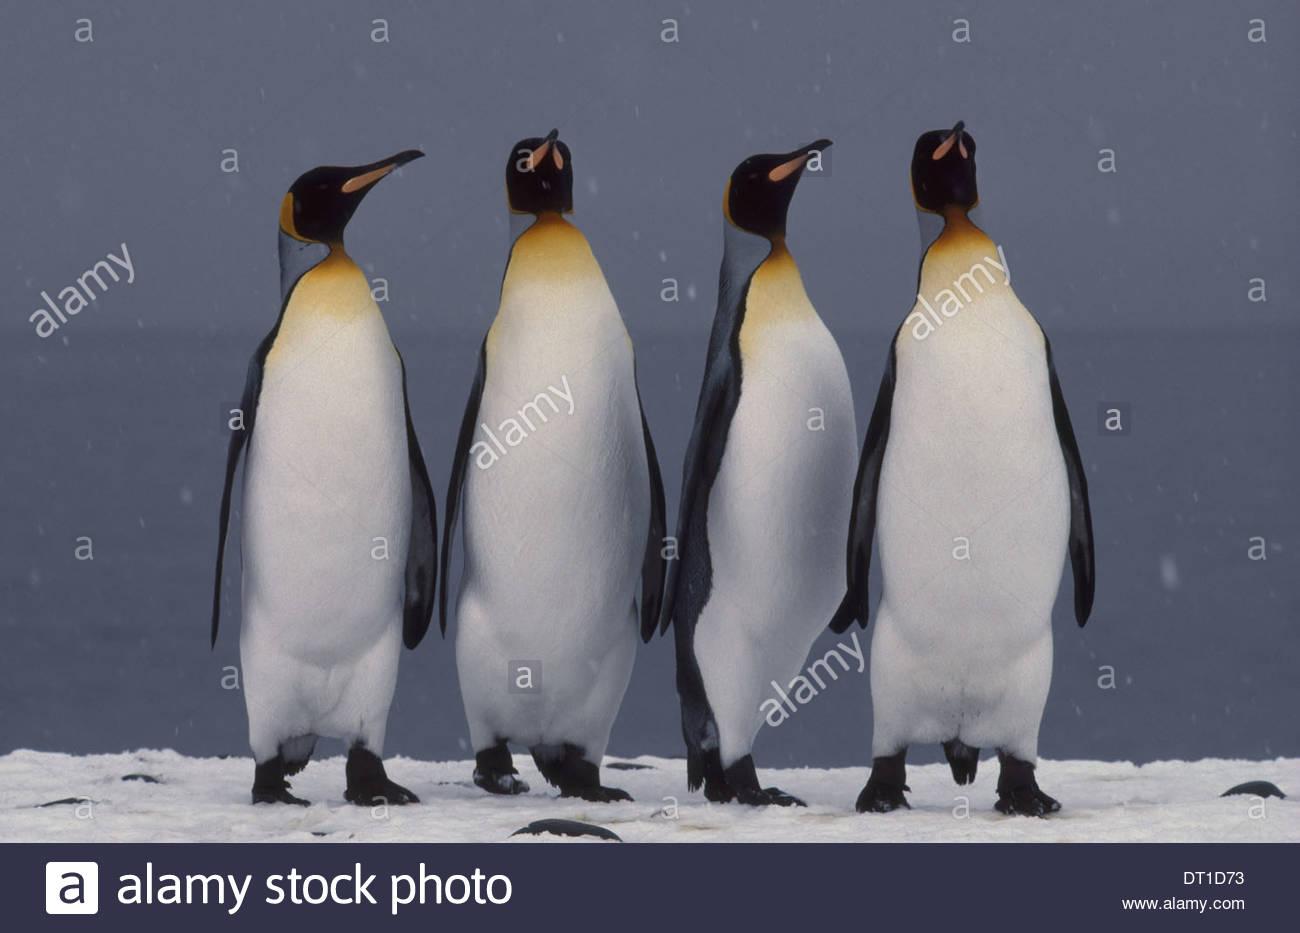 South Georgia Island King penguins courting Aptenodytes patagonicus - Stock Image